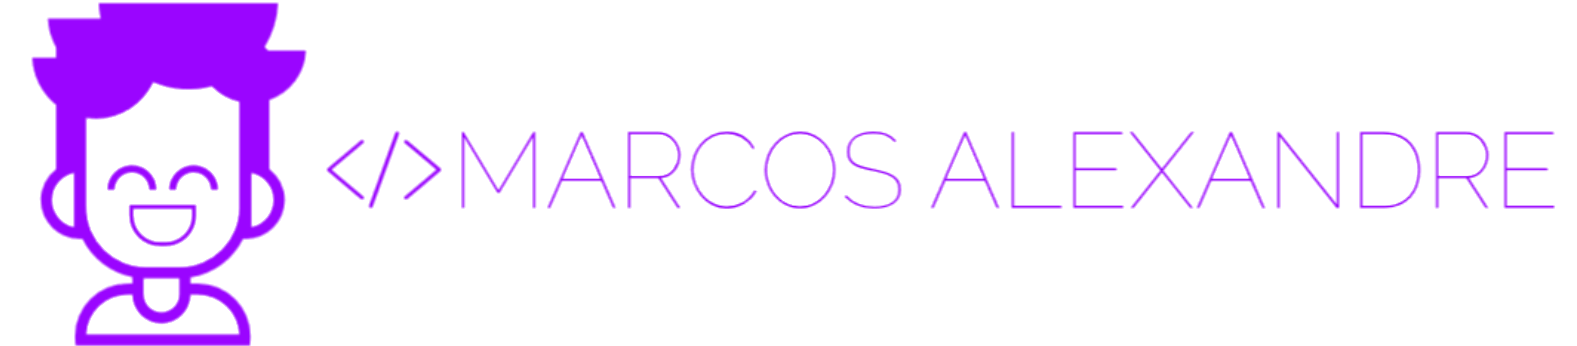 LogoMarcosAlexandre